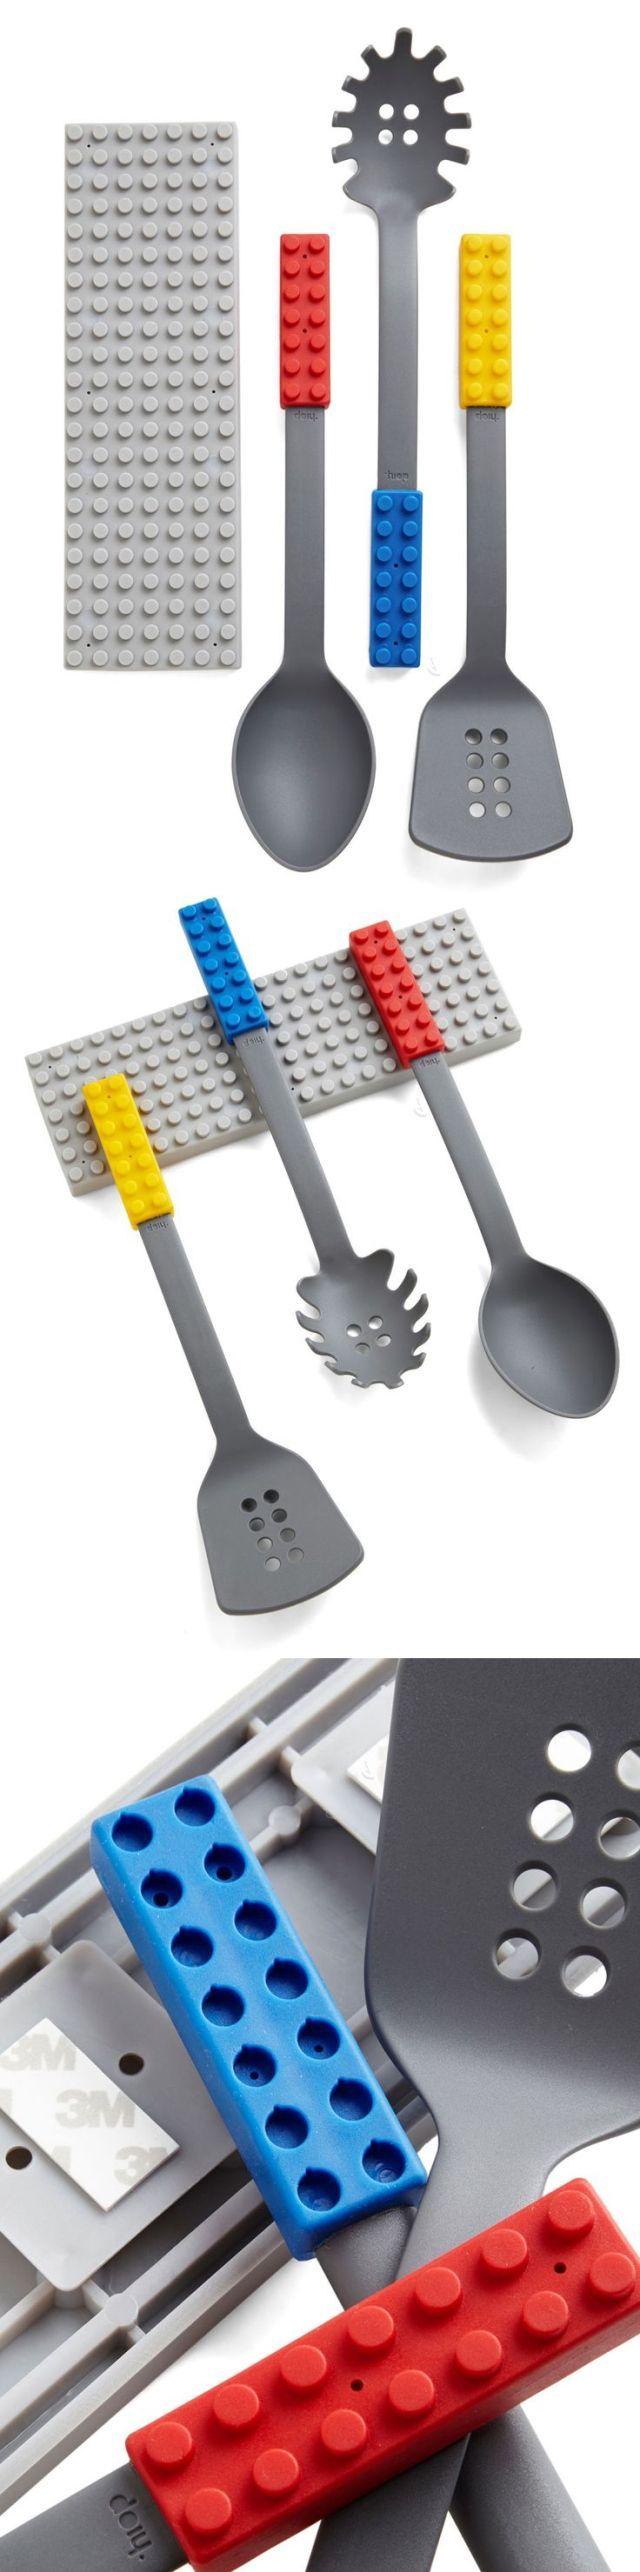 44 best Kitchen Appliance images on Pinterest | Product design ...